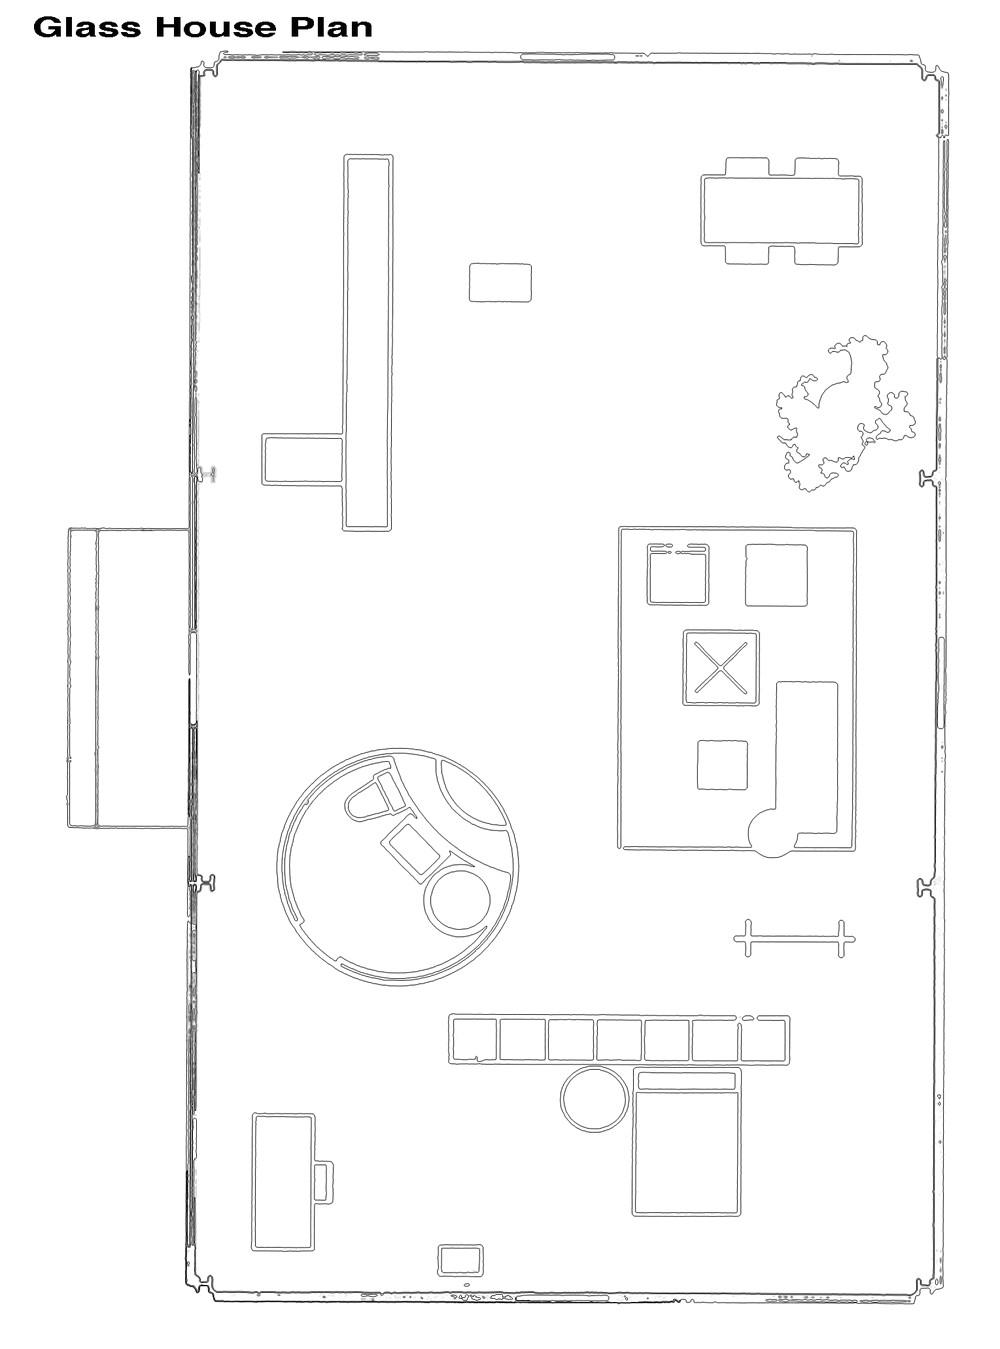 glass house philip johnson plan